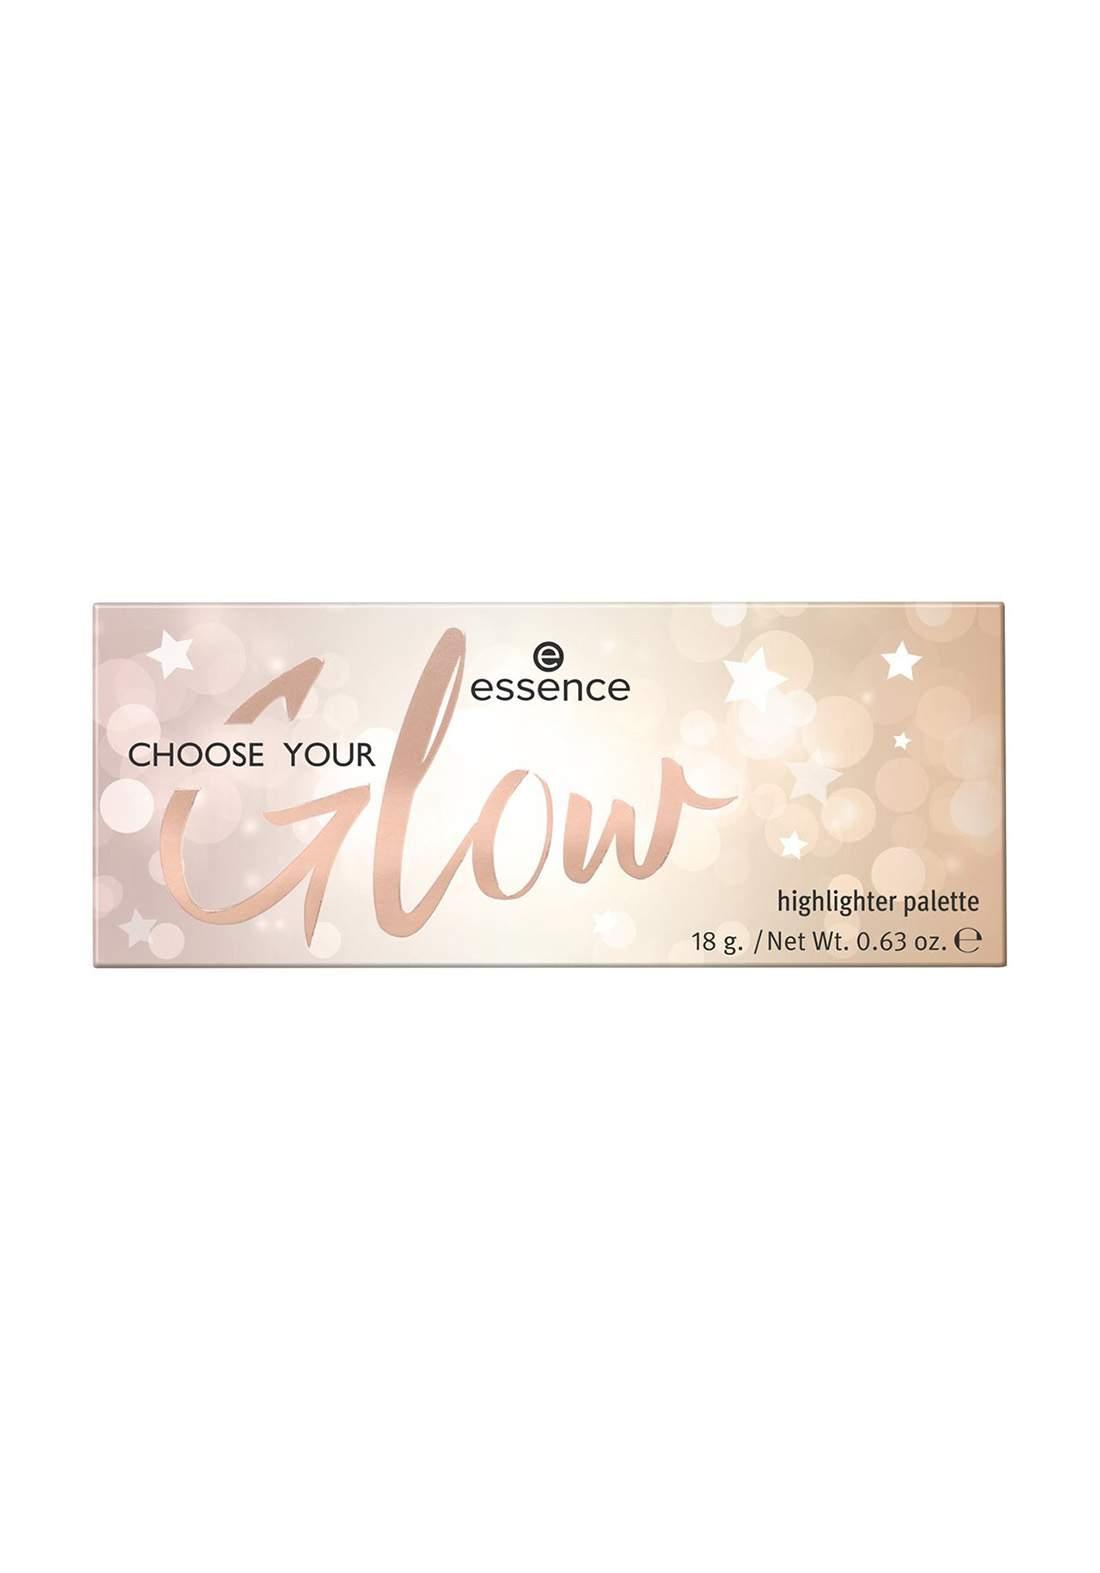 Essence Choose Your Glow Highlighter Palette 18g باليت هايلايتر